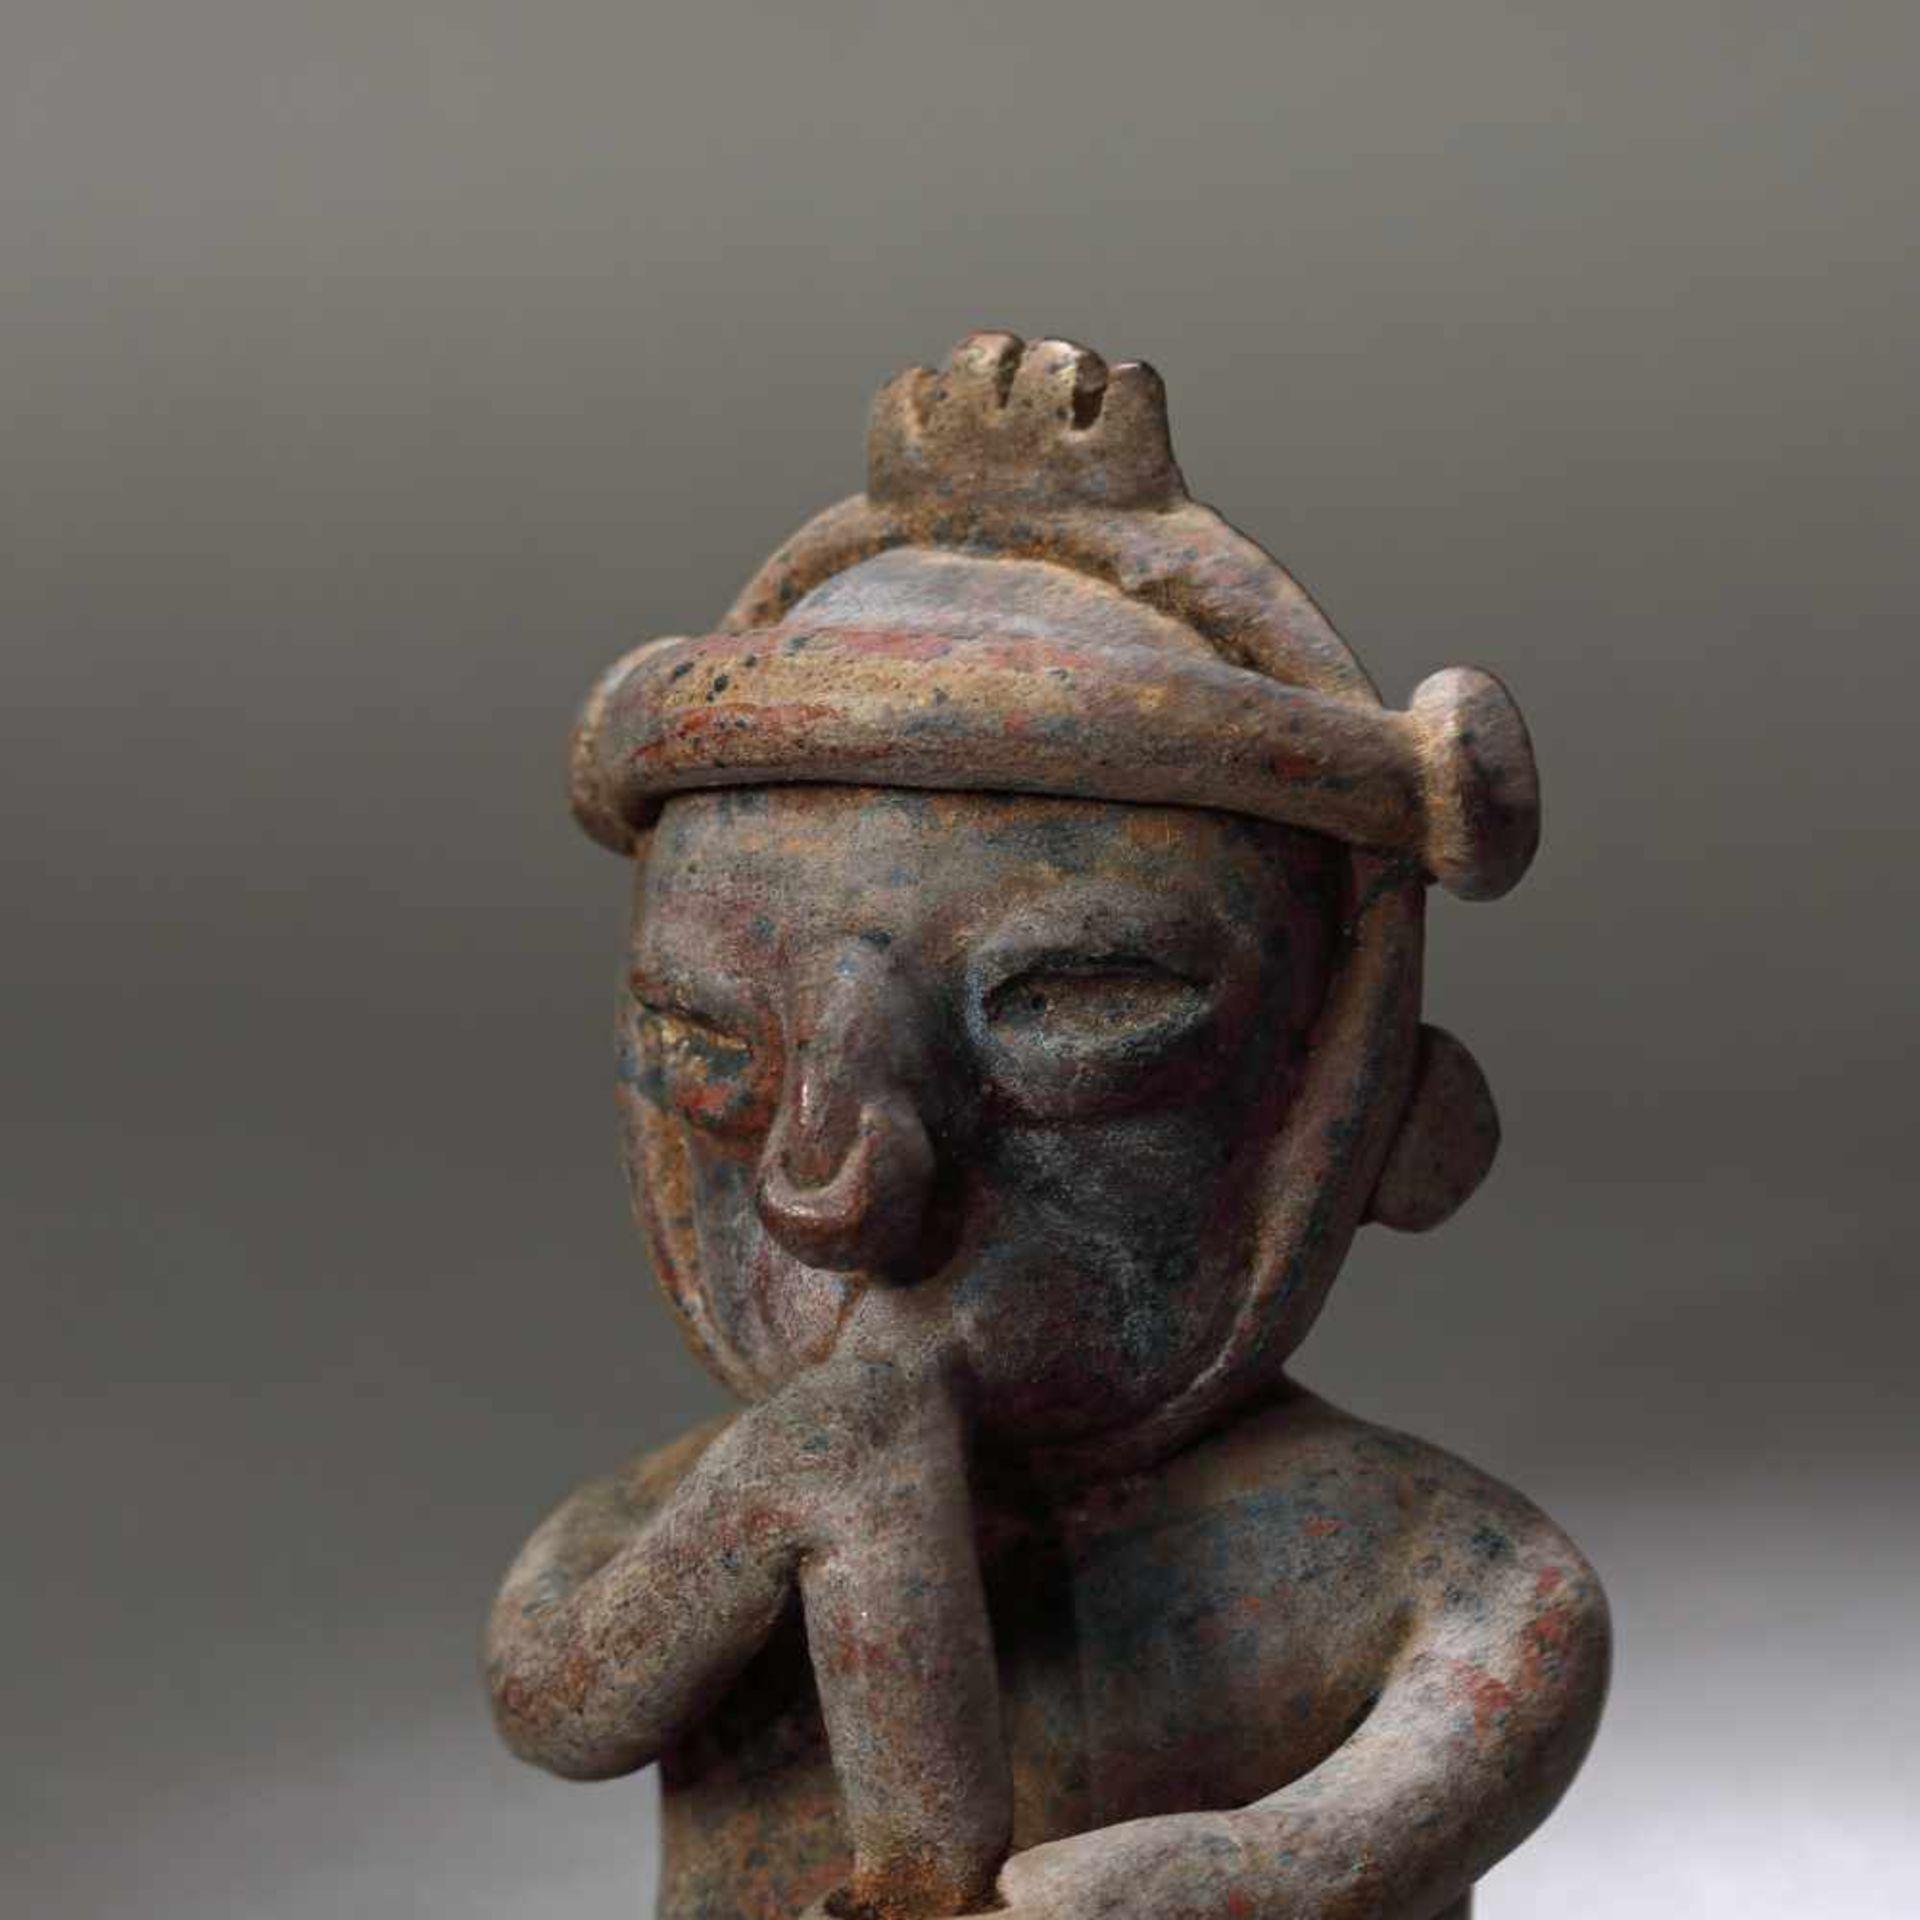 Ceramic figurine depicting a man smoking, Colima culture, Mexico, approx. 2,000 years old, 1st centu - Bild 2 aus 6